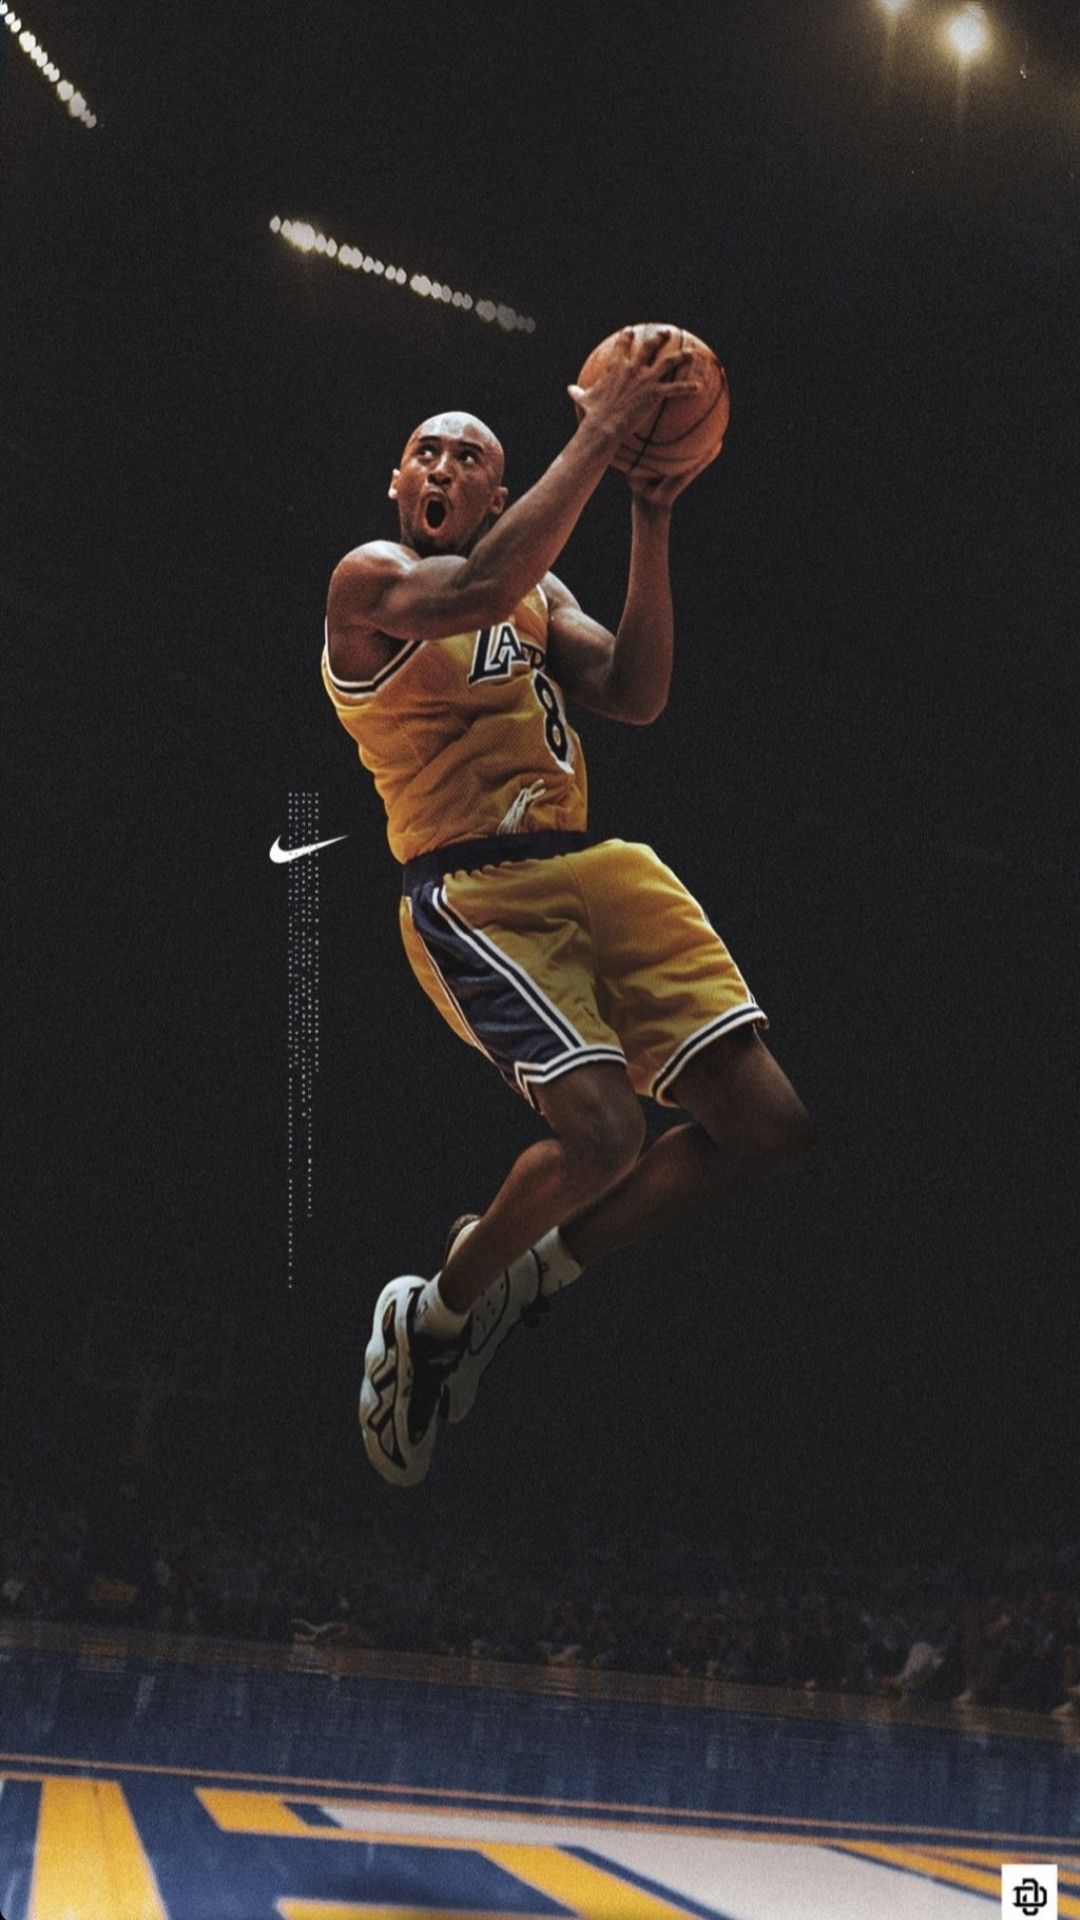 Kobe Bryant Wallpaper Kobe Bryant Wallpaper Kobe Bryant Pictures Kobe Bryant Nba